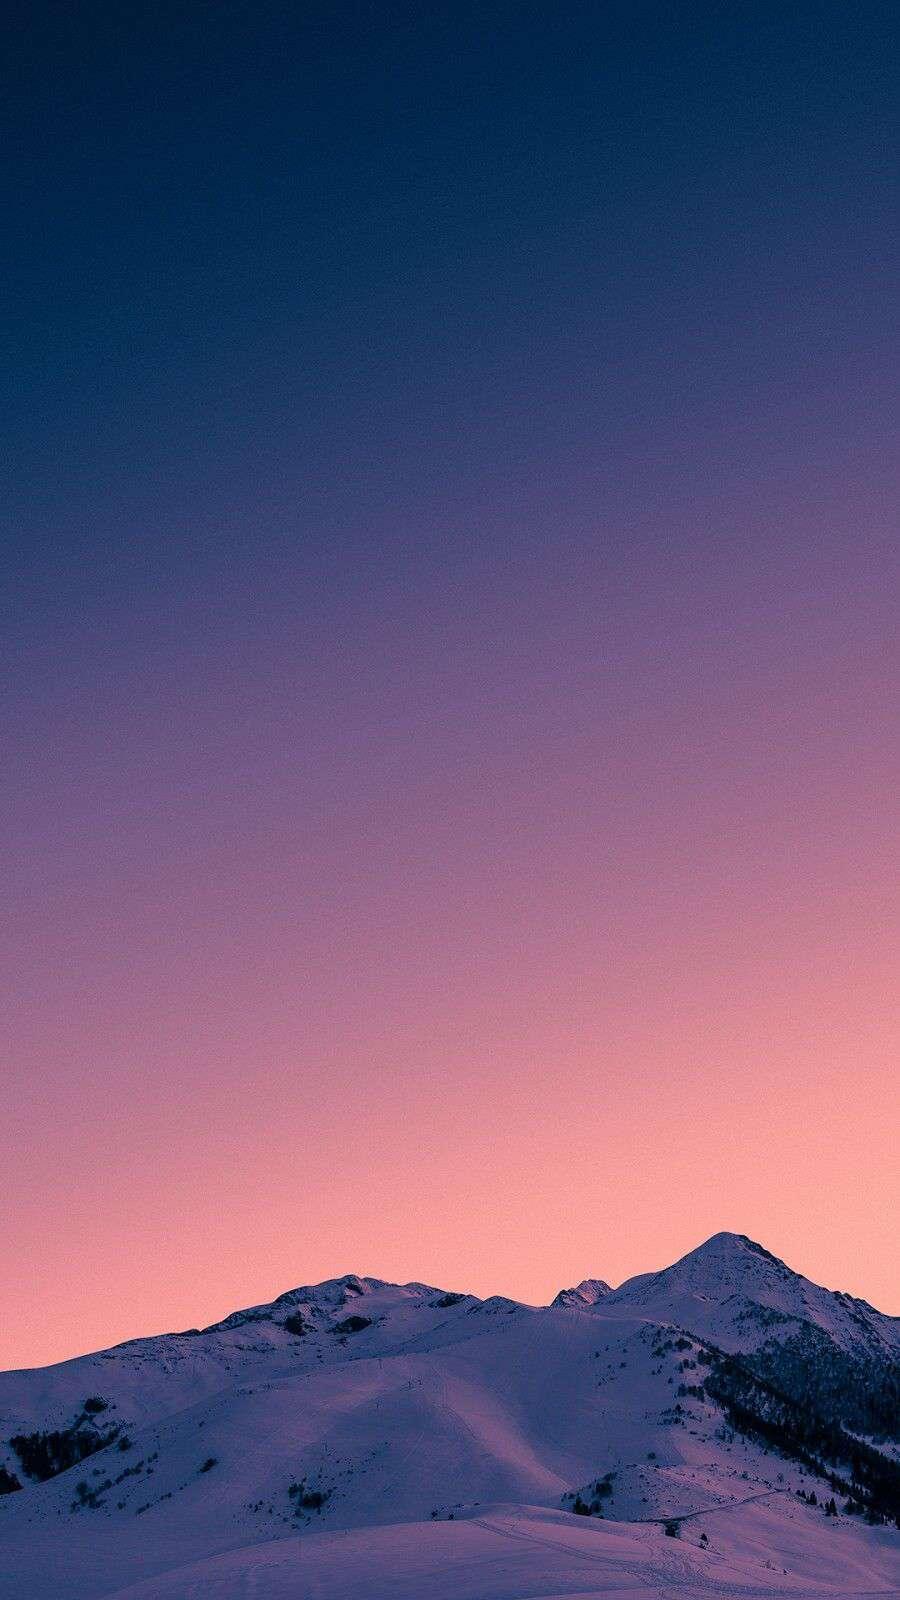 Sunset Snow Mountain Sky View iPhone Wallpaper